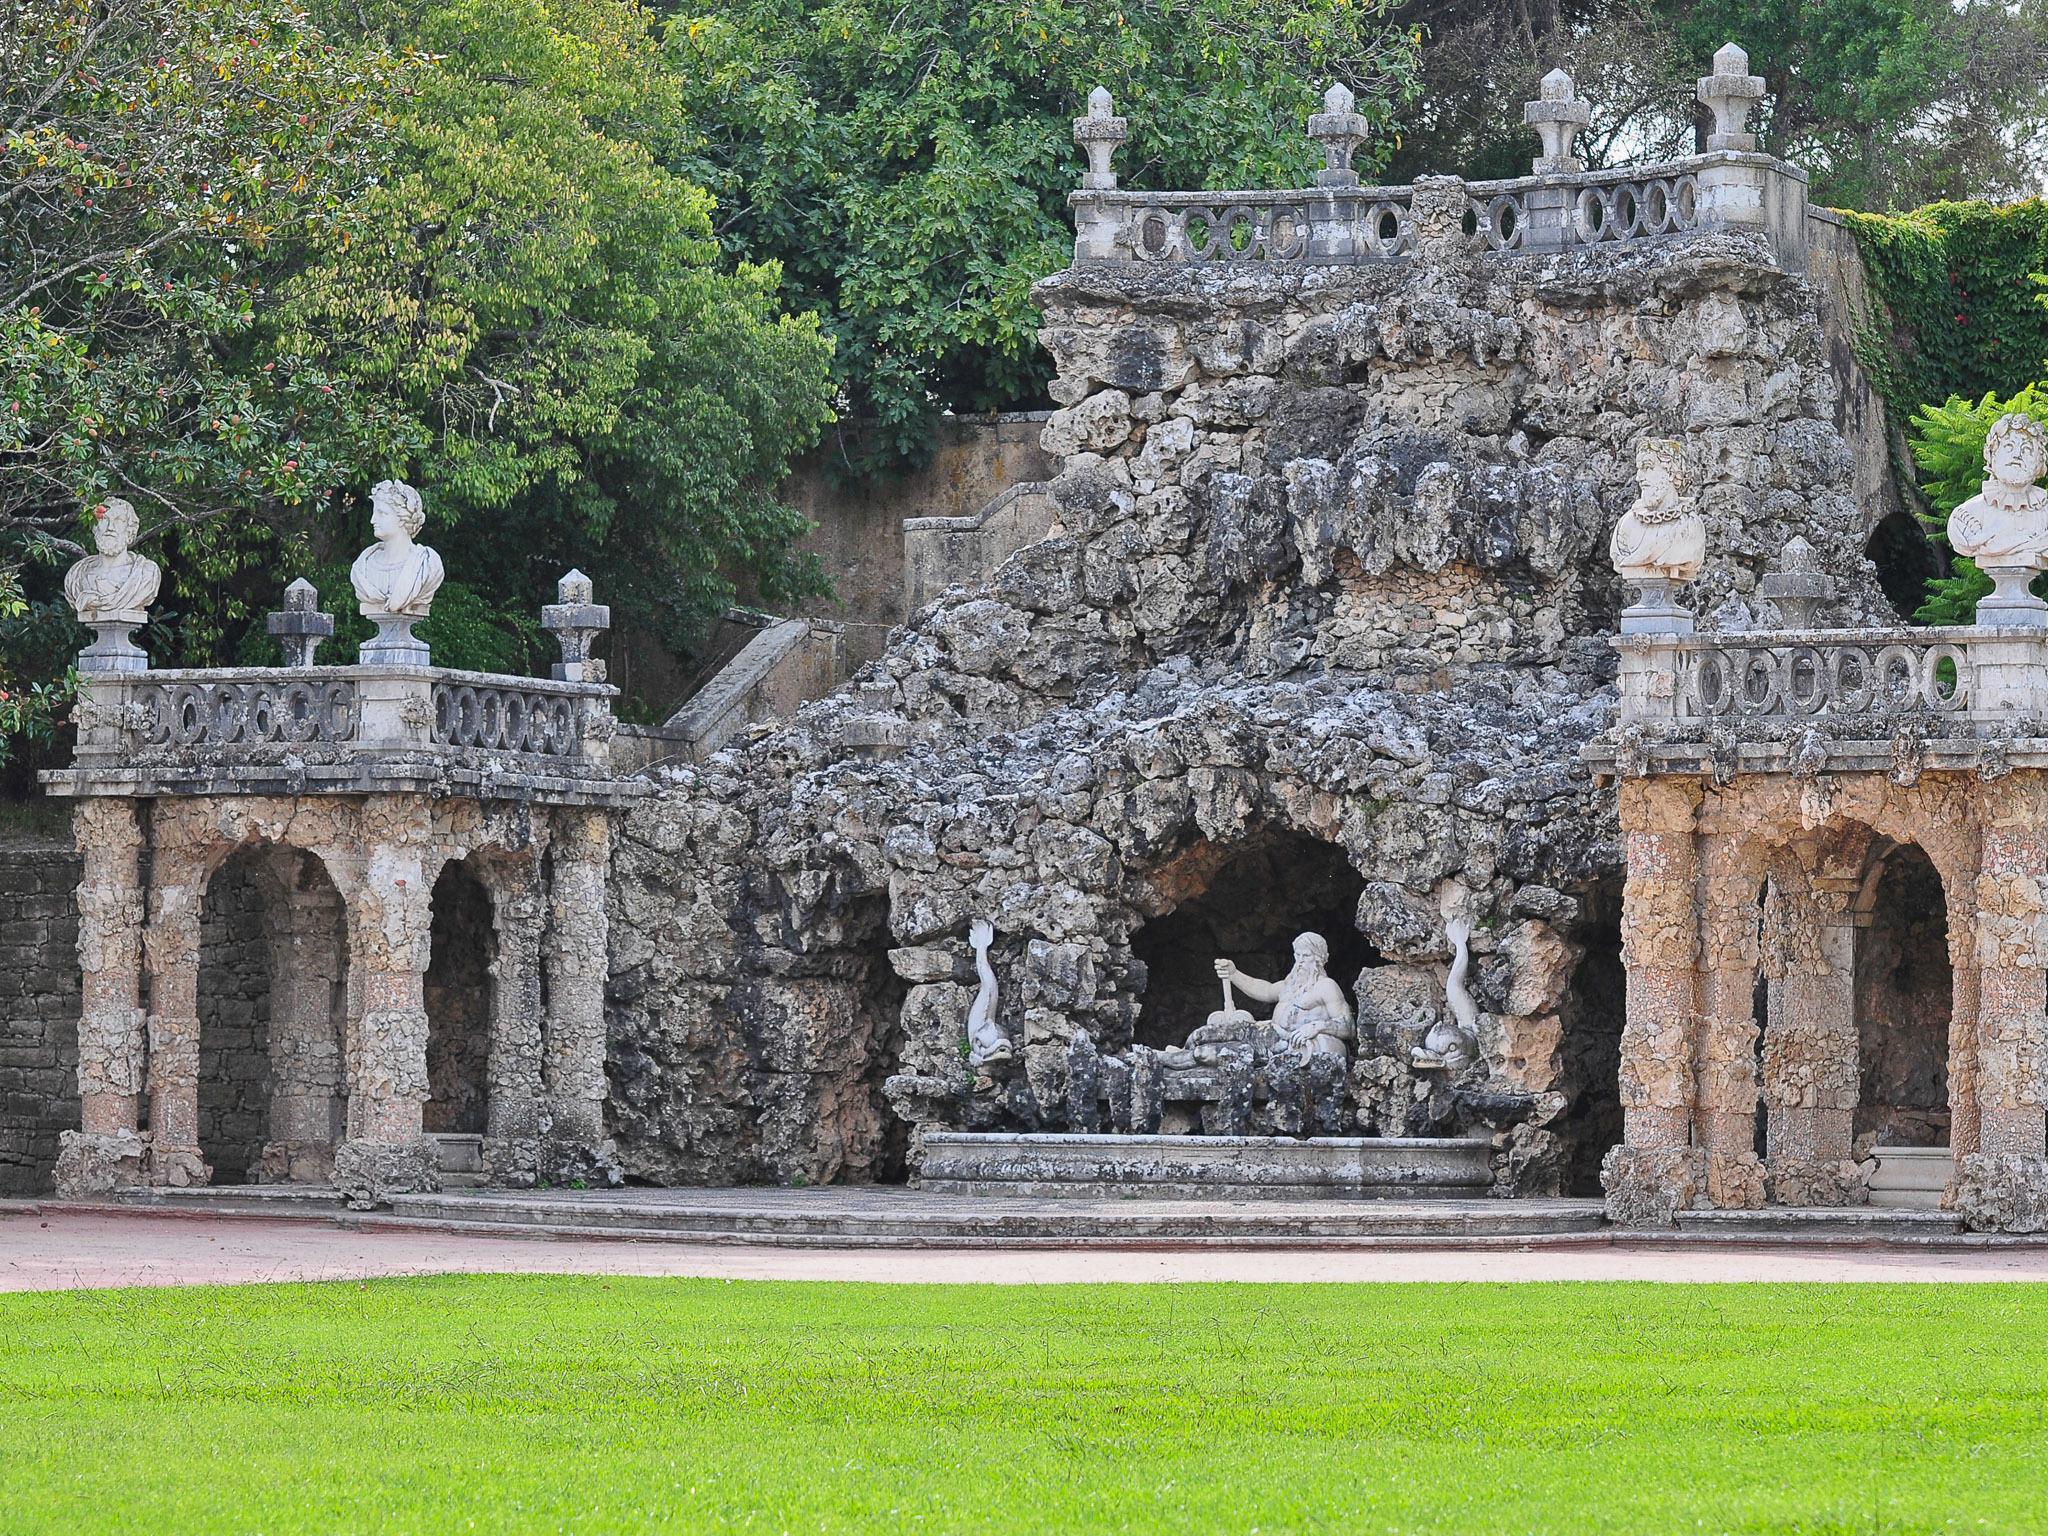 Jardins do Palácio Marquês de Pombal